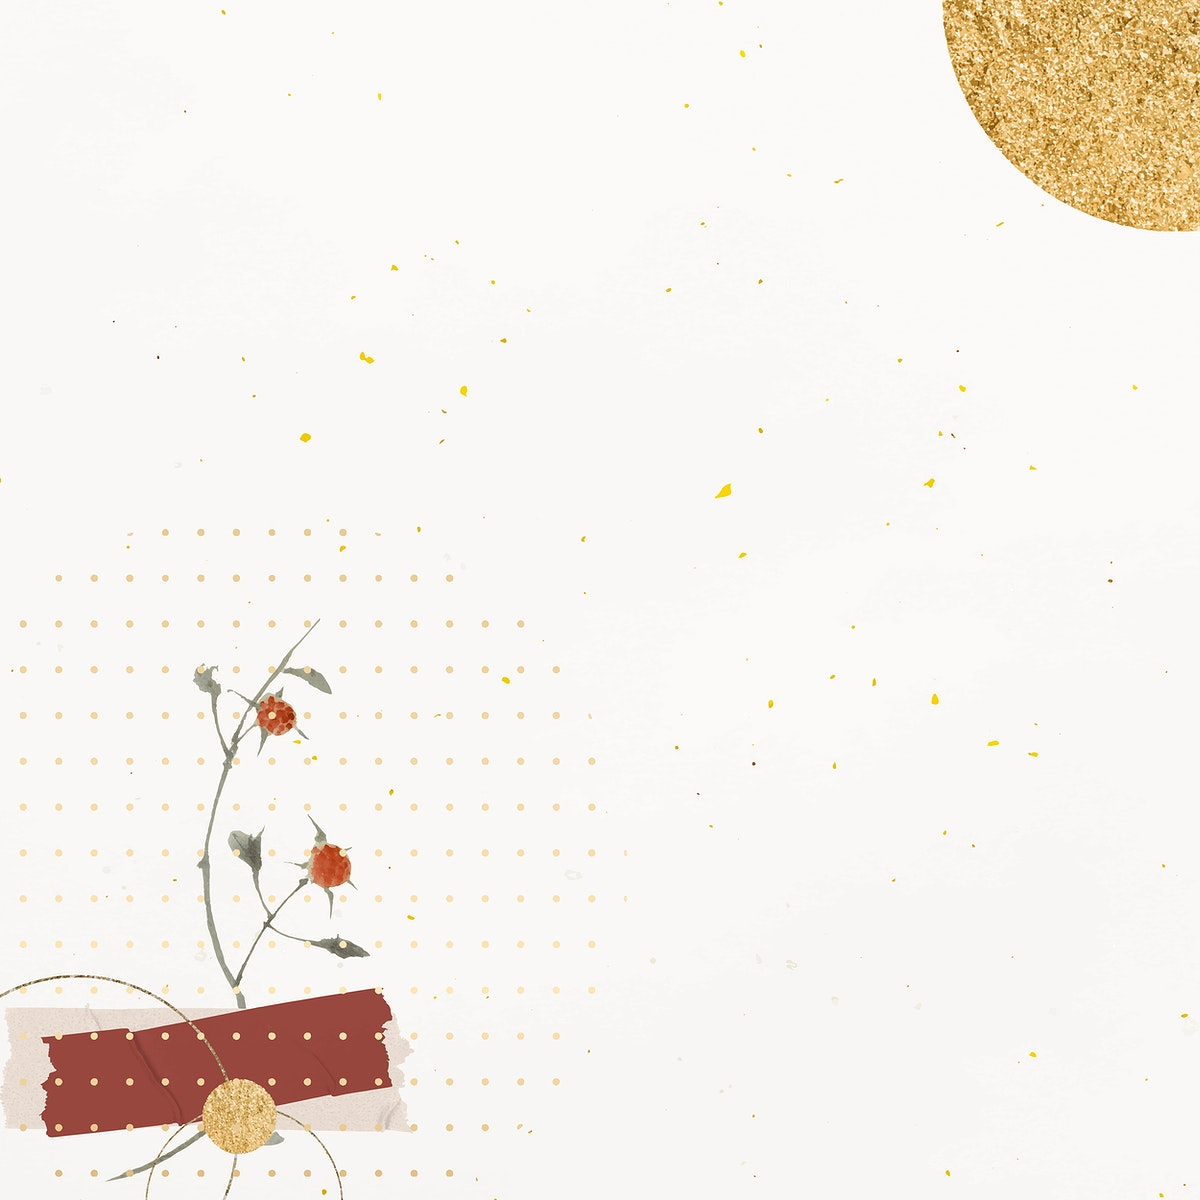 Blank shimmering golden paper vector